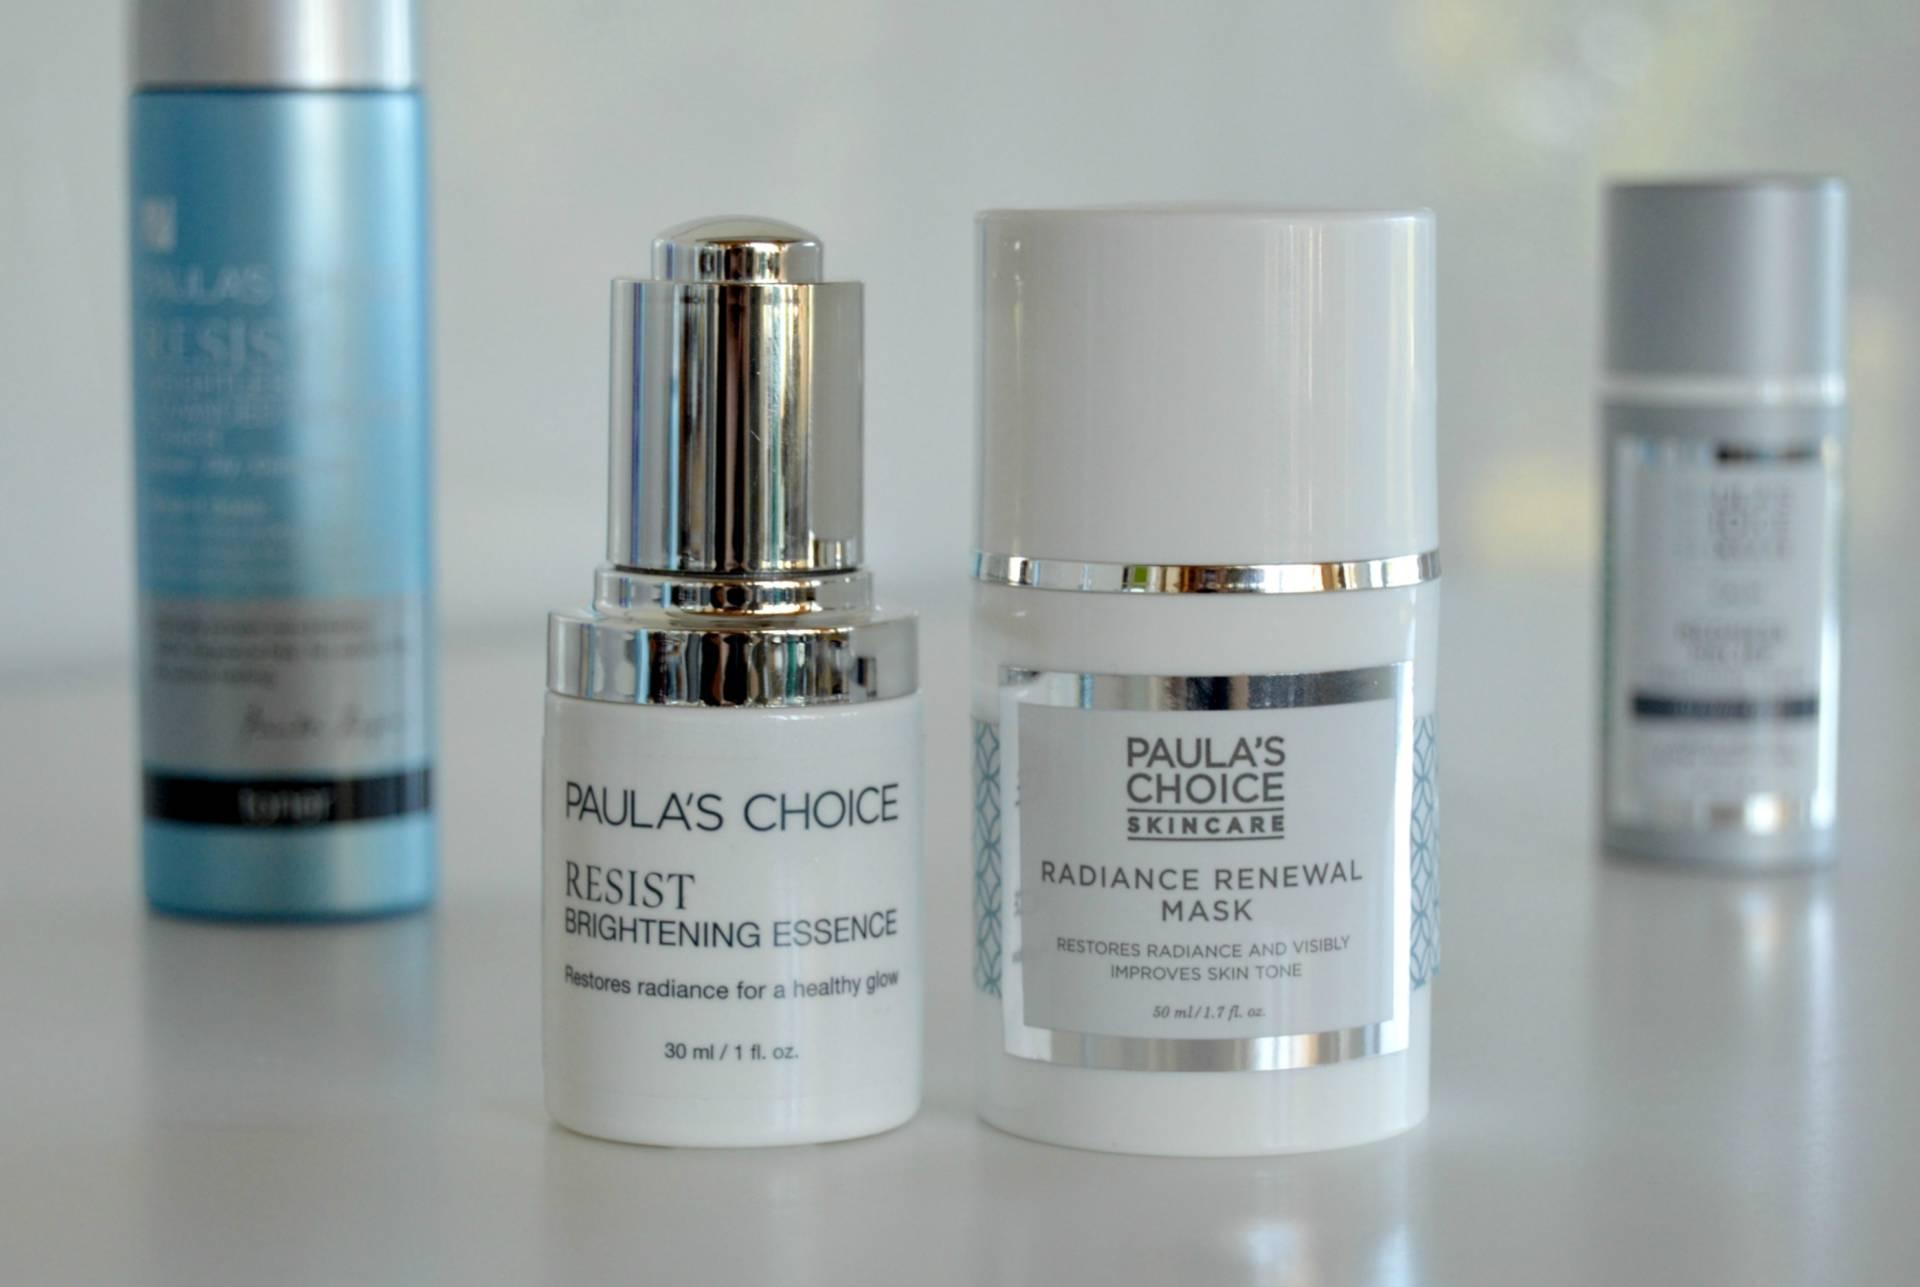 paulas choice radiance renewal mask brightening essence new review inhautepursuit